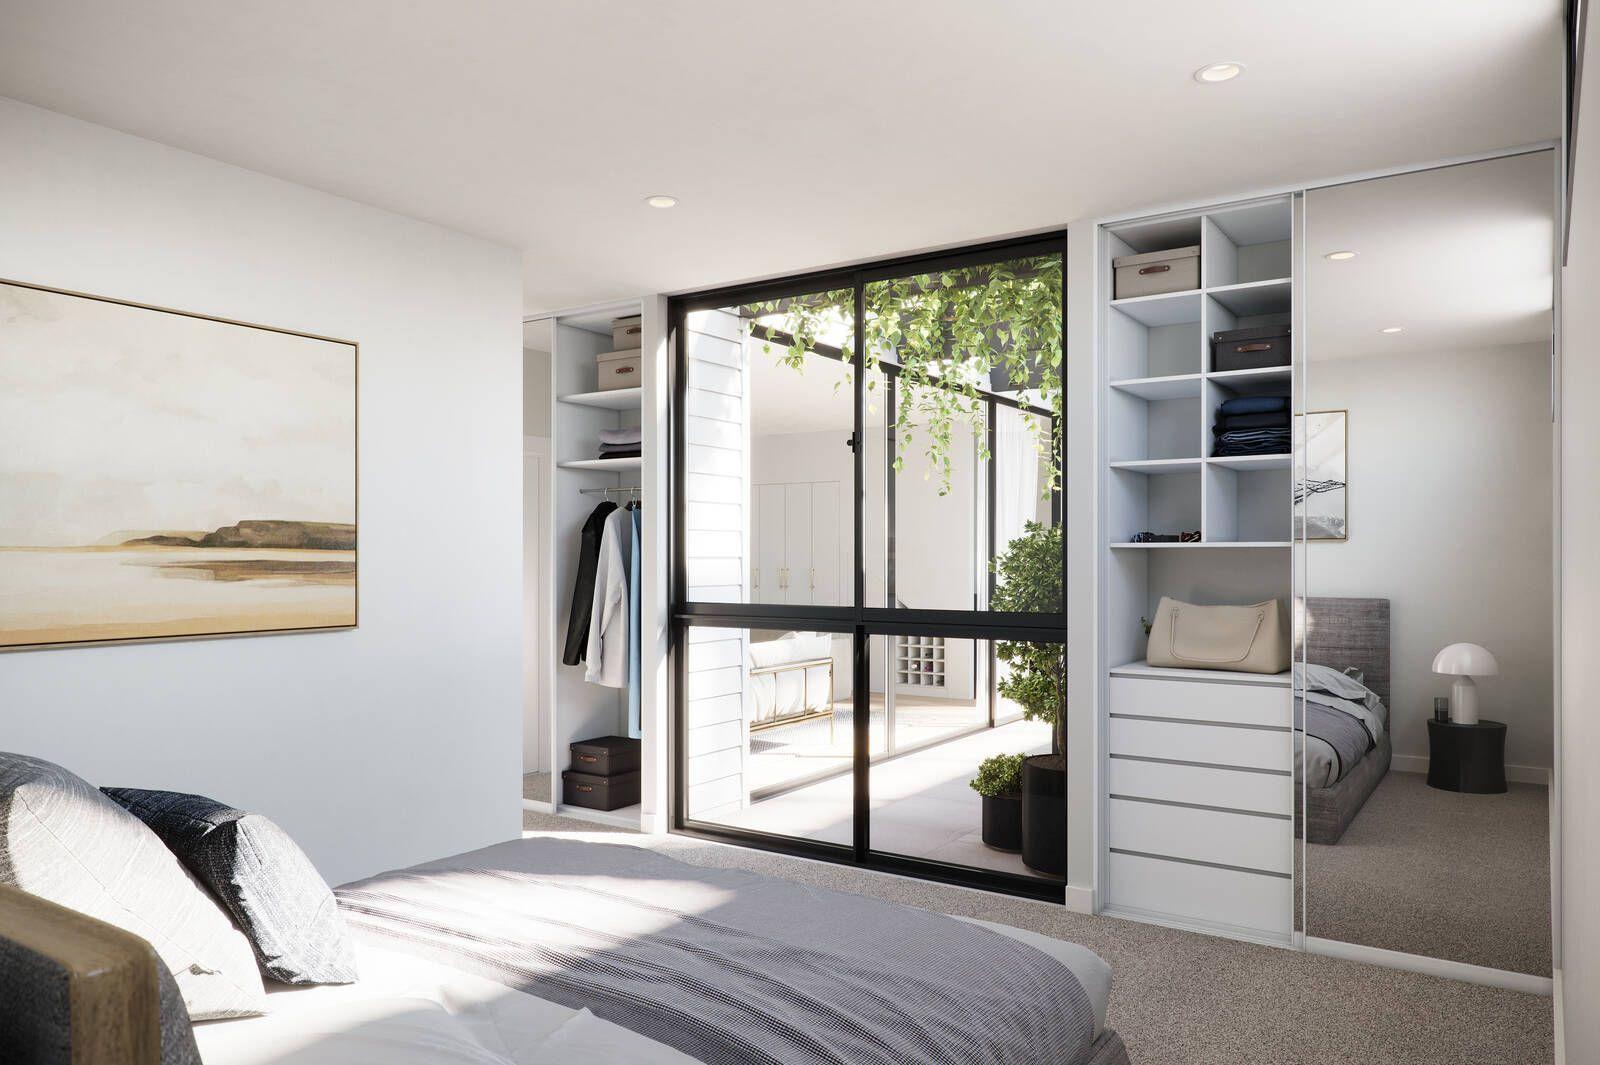 3/9 Scarlett Street, Geelong West VIC 3218, Image 2